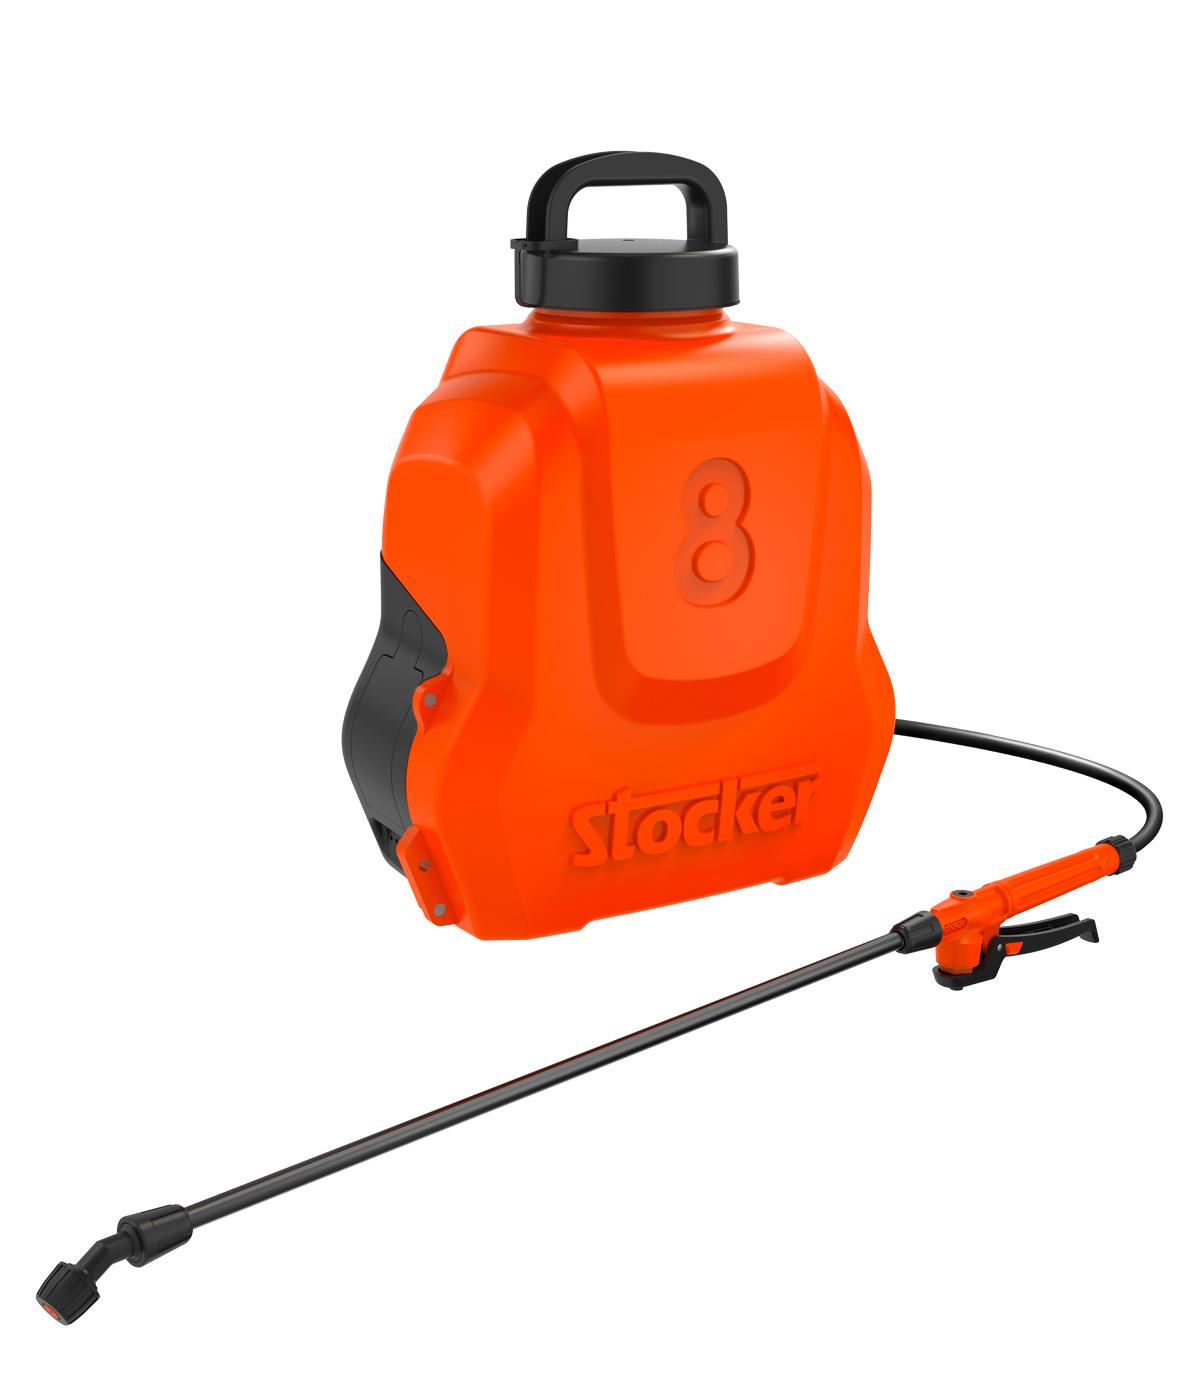 237-pompa-irroratrice-elettrica-a-zaino-li-ion-stocker-8-litri